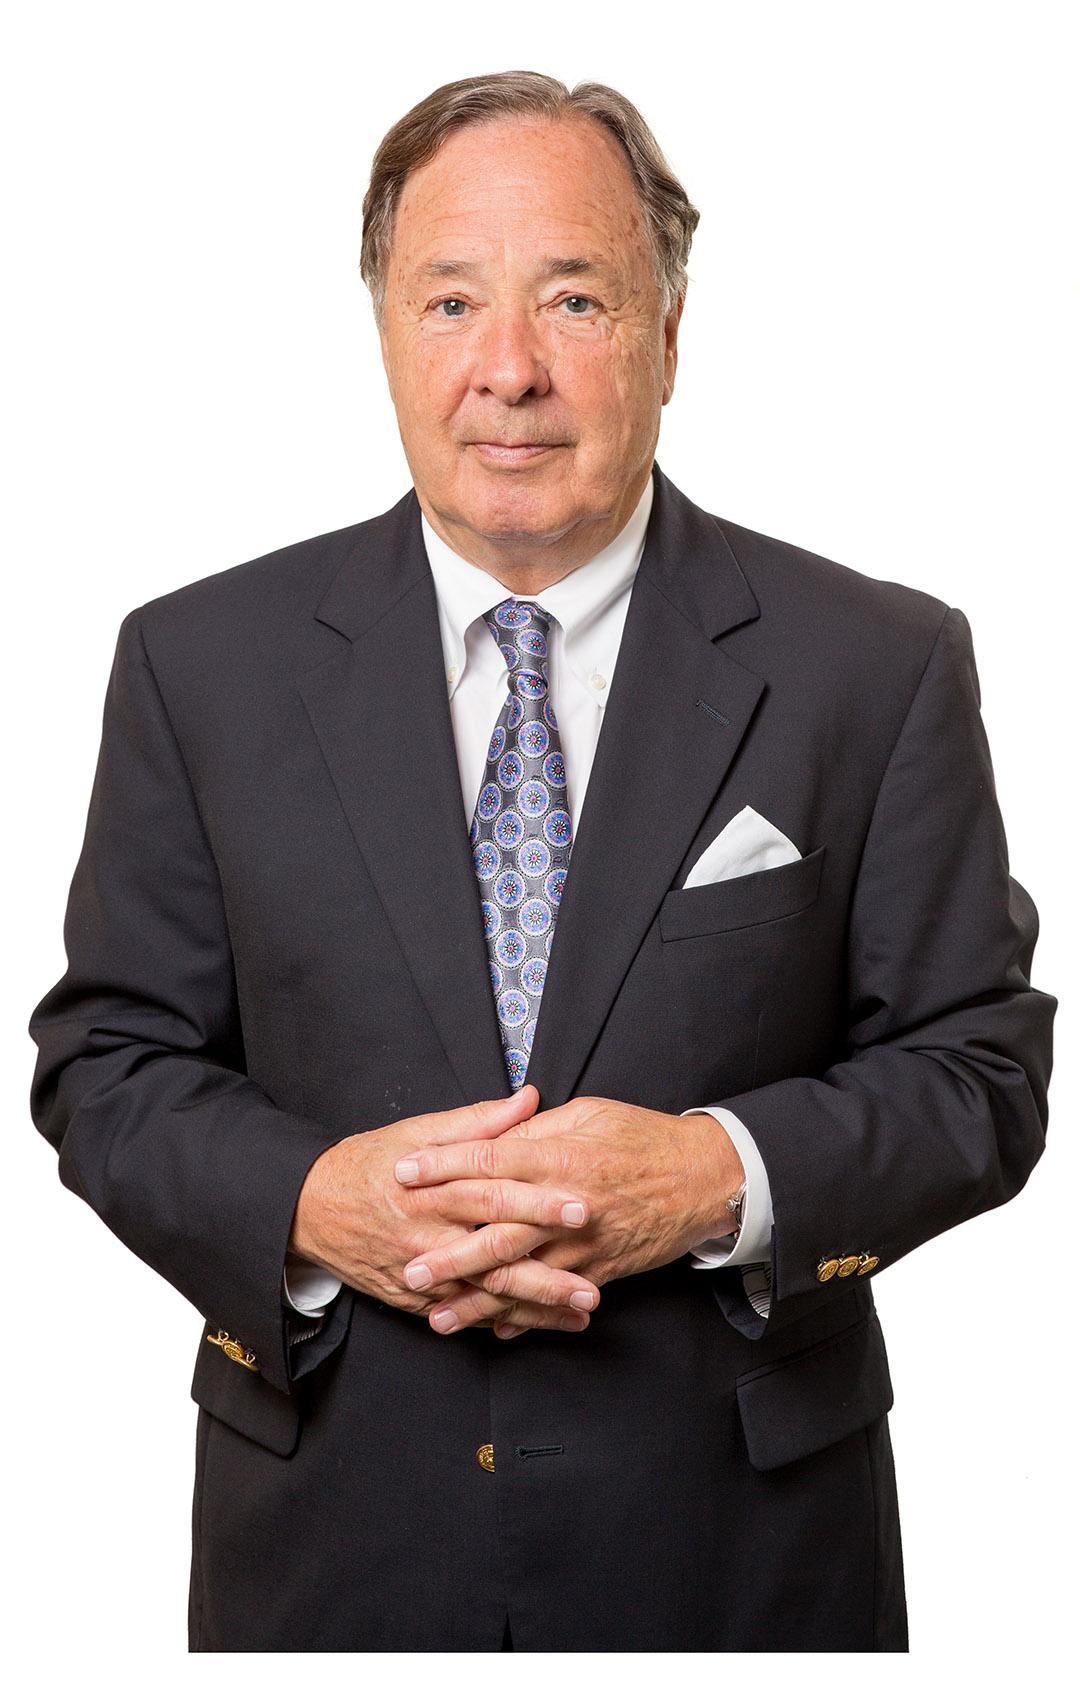 John J. Raymond